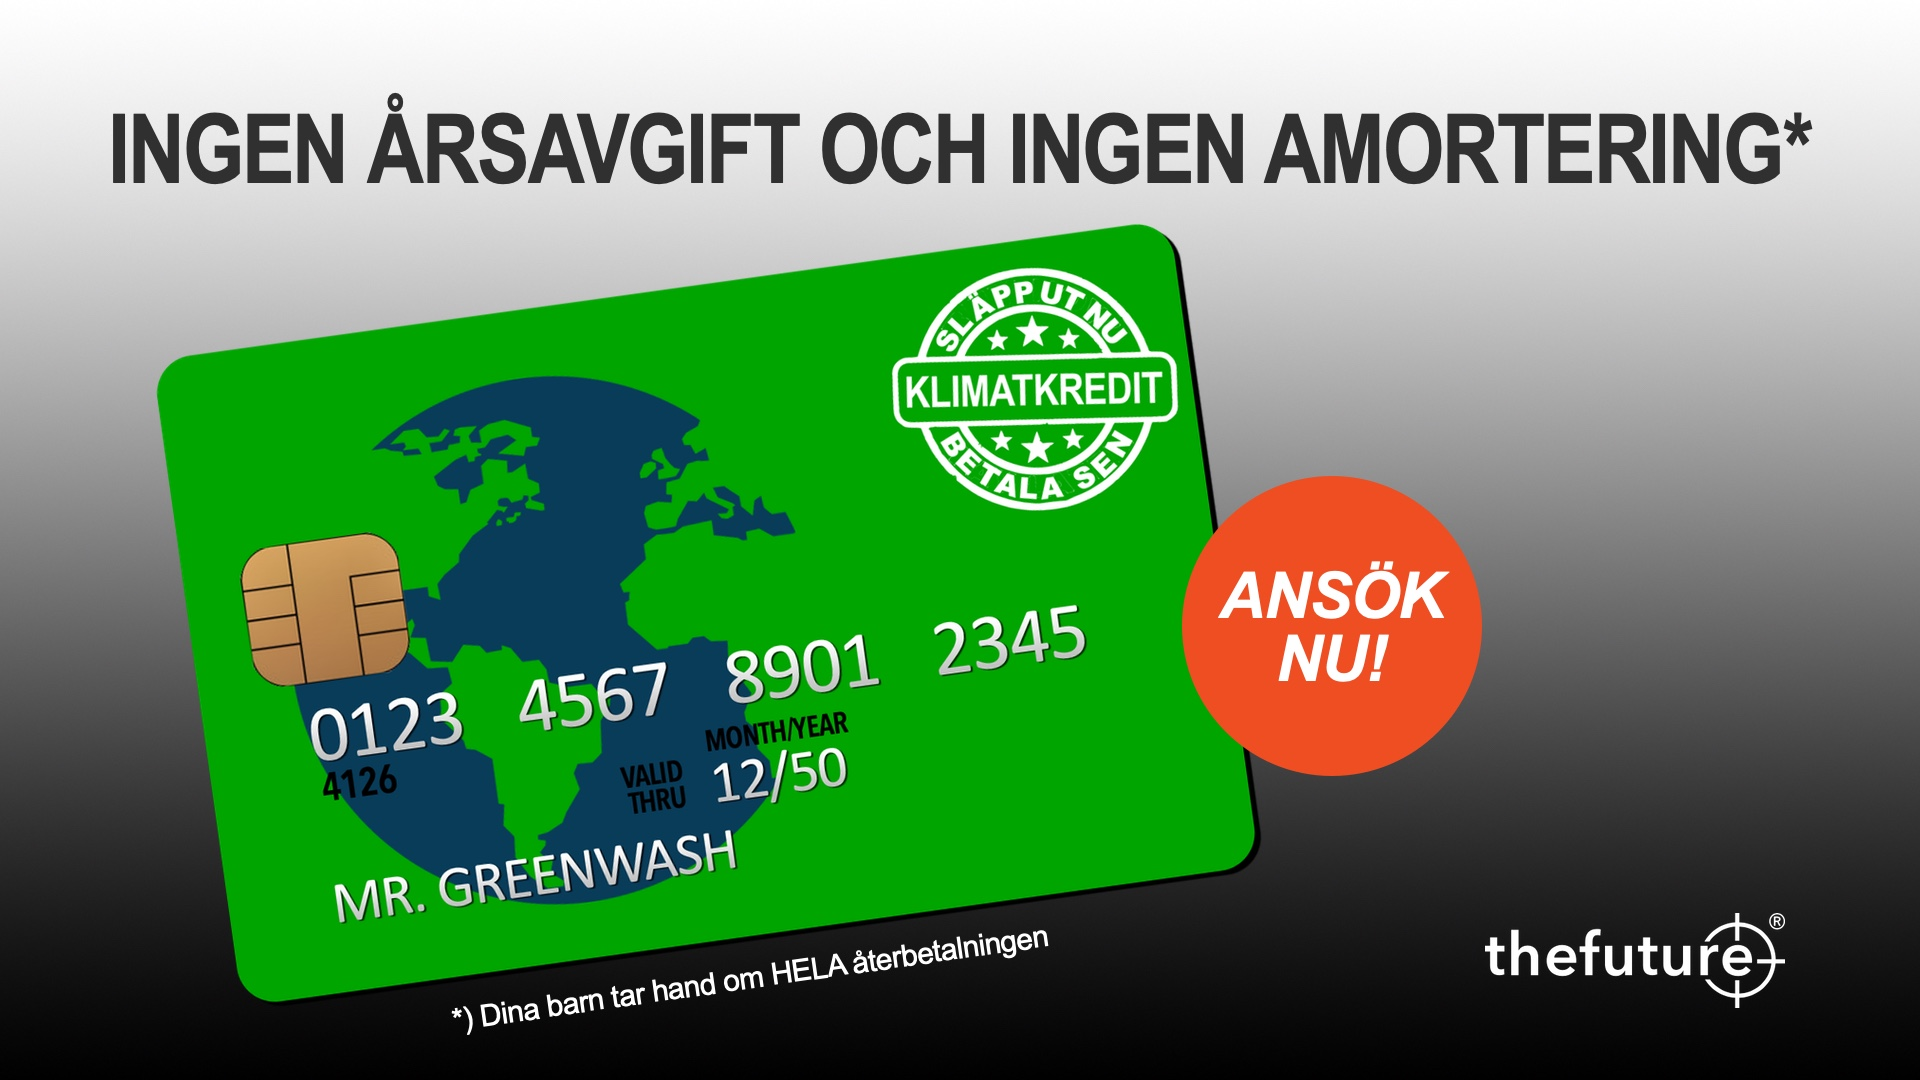 thefuture, Blogg, Greenwash-Kreditkort